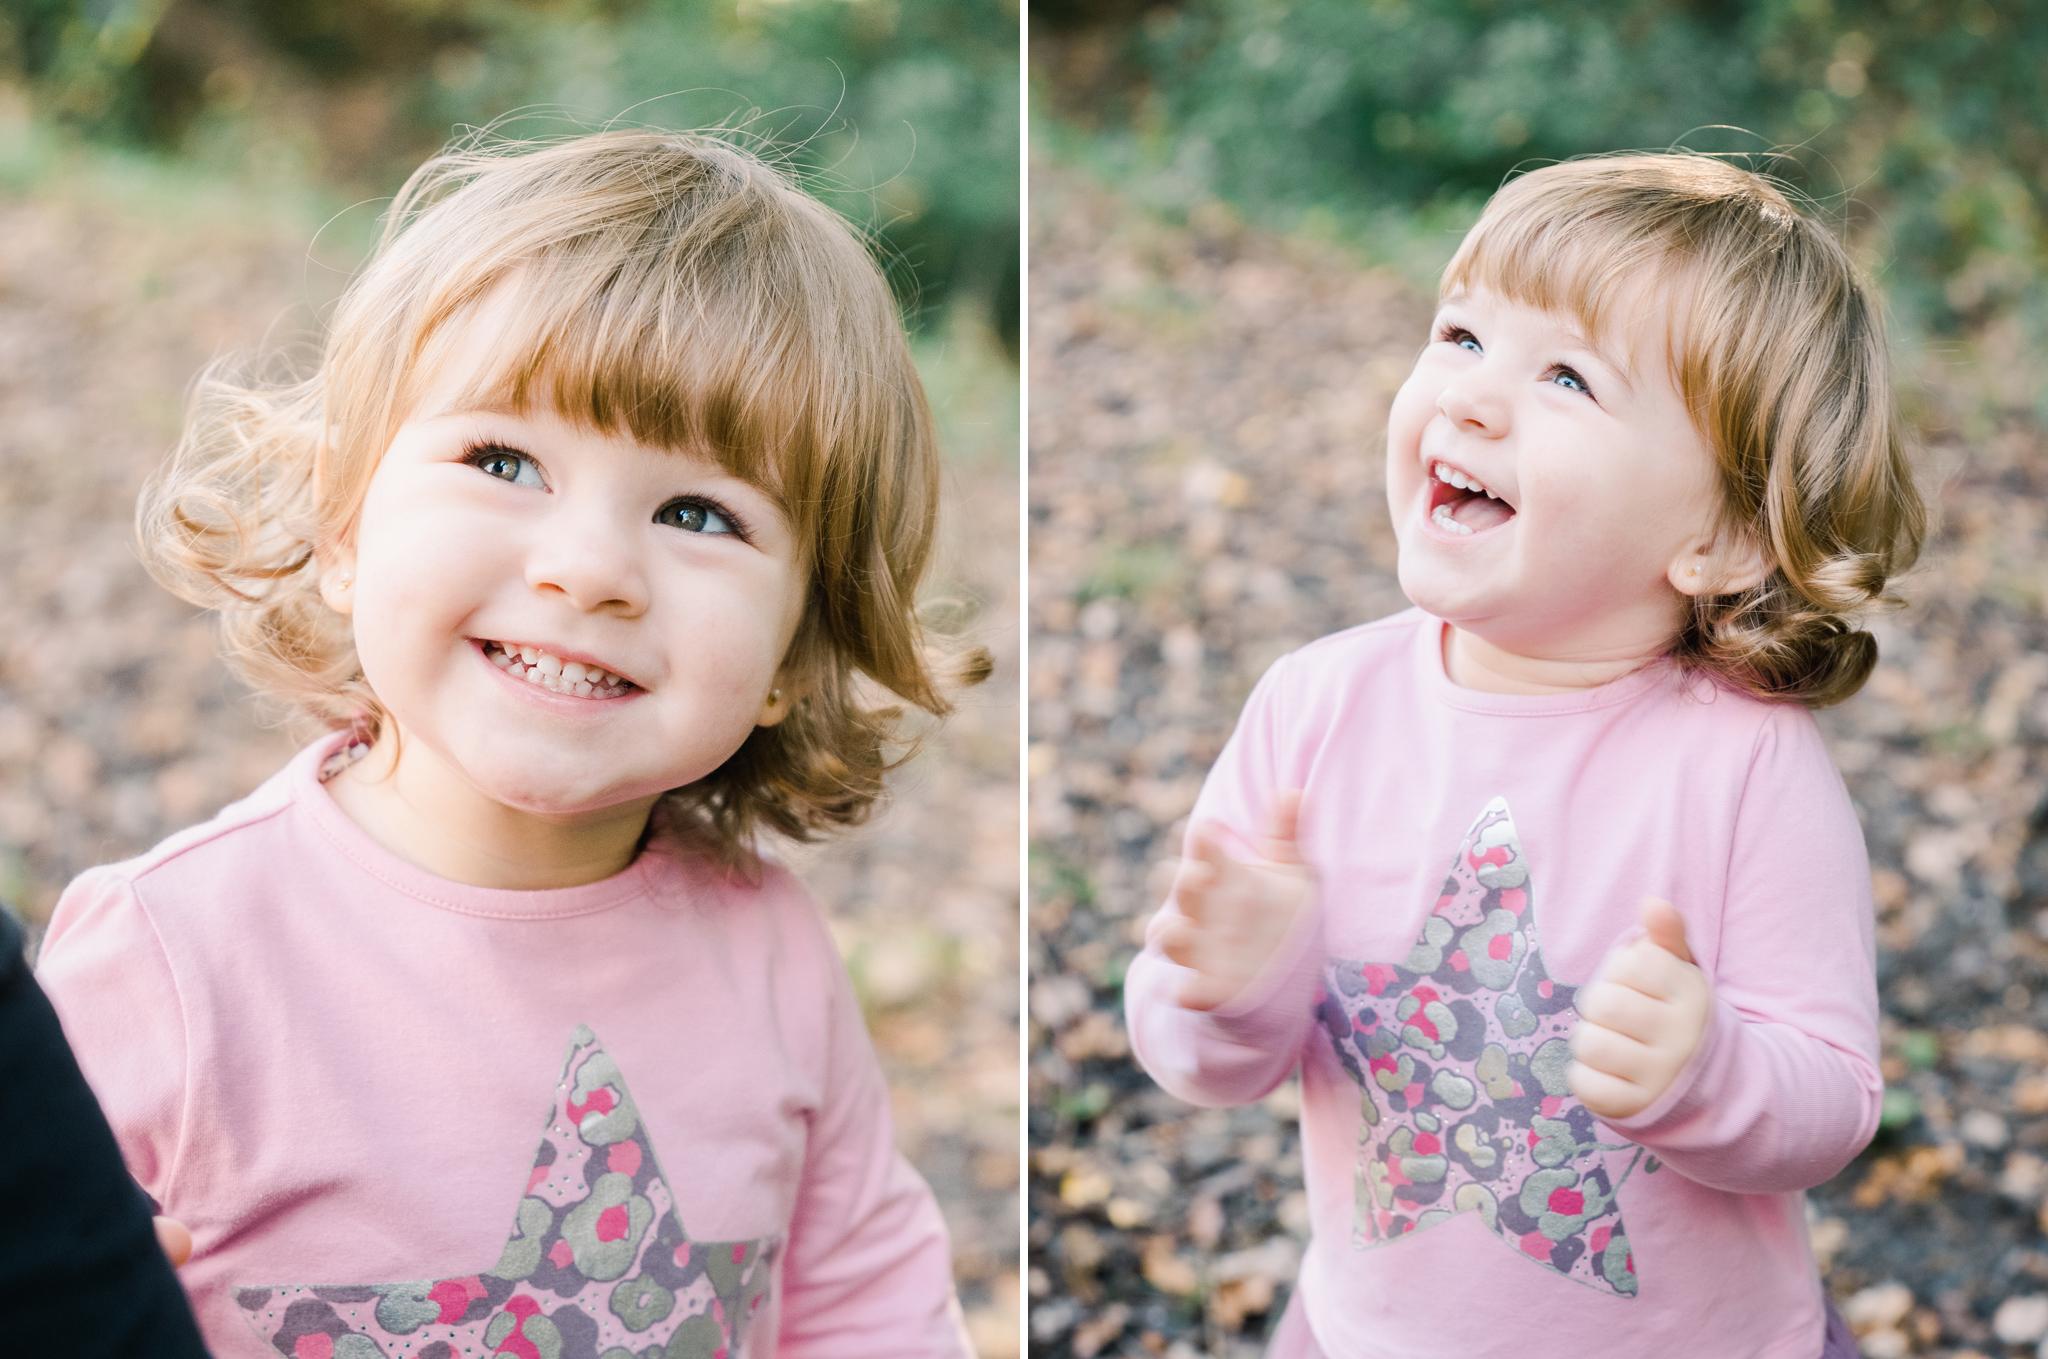 fotografia-infantil-familiar12.jpg